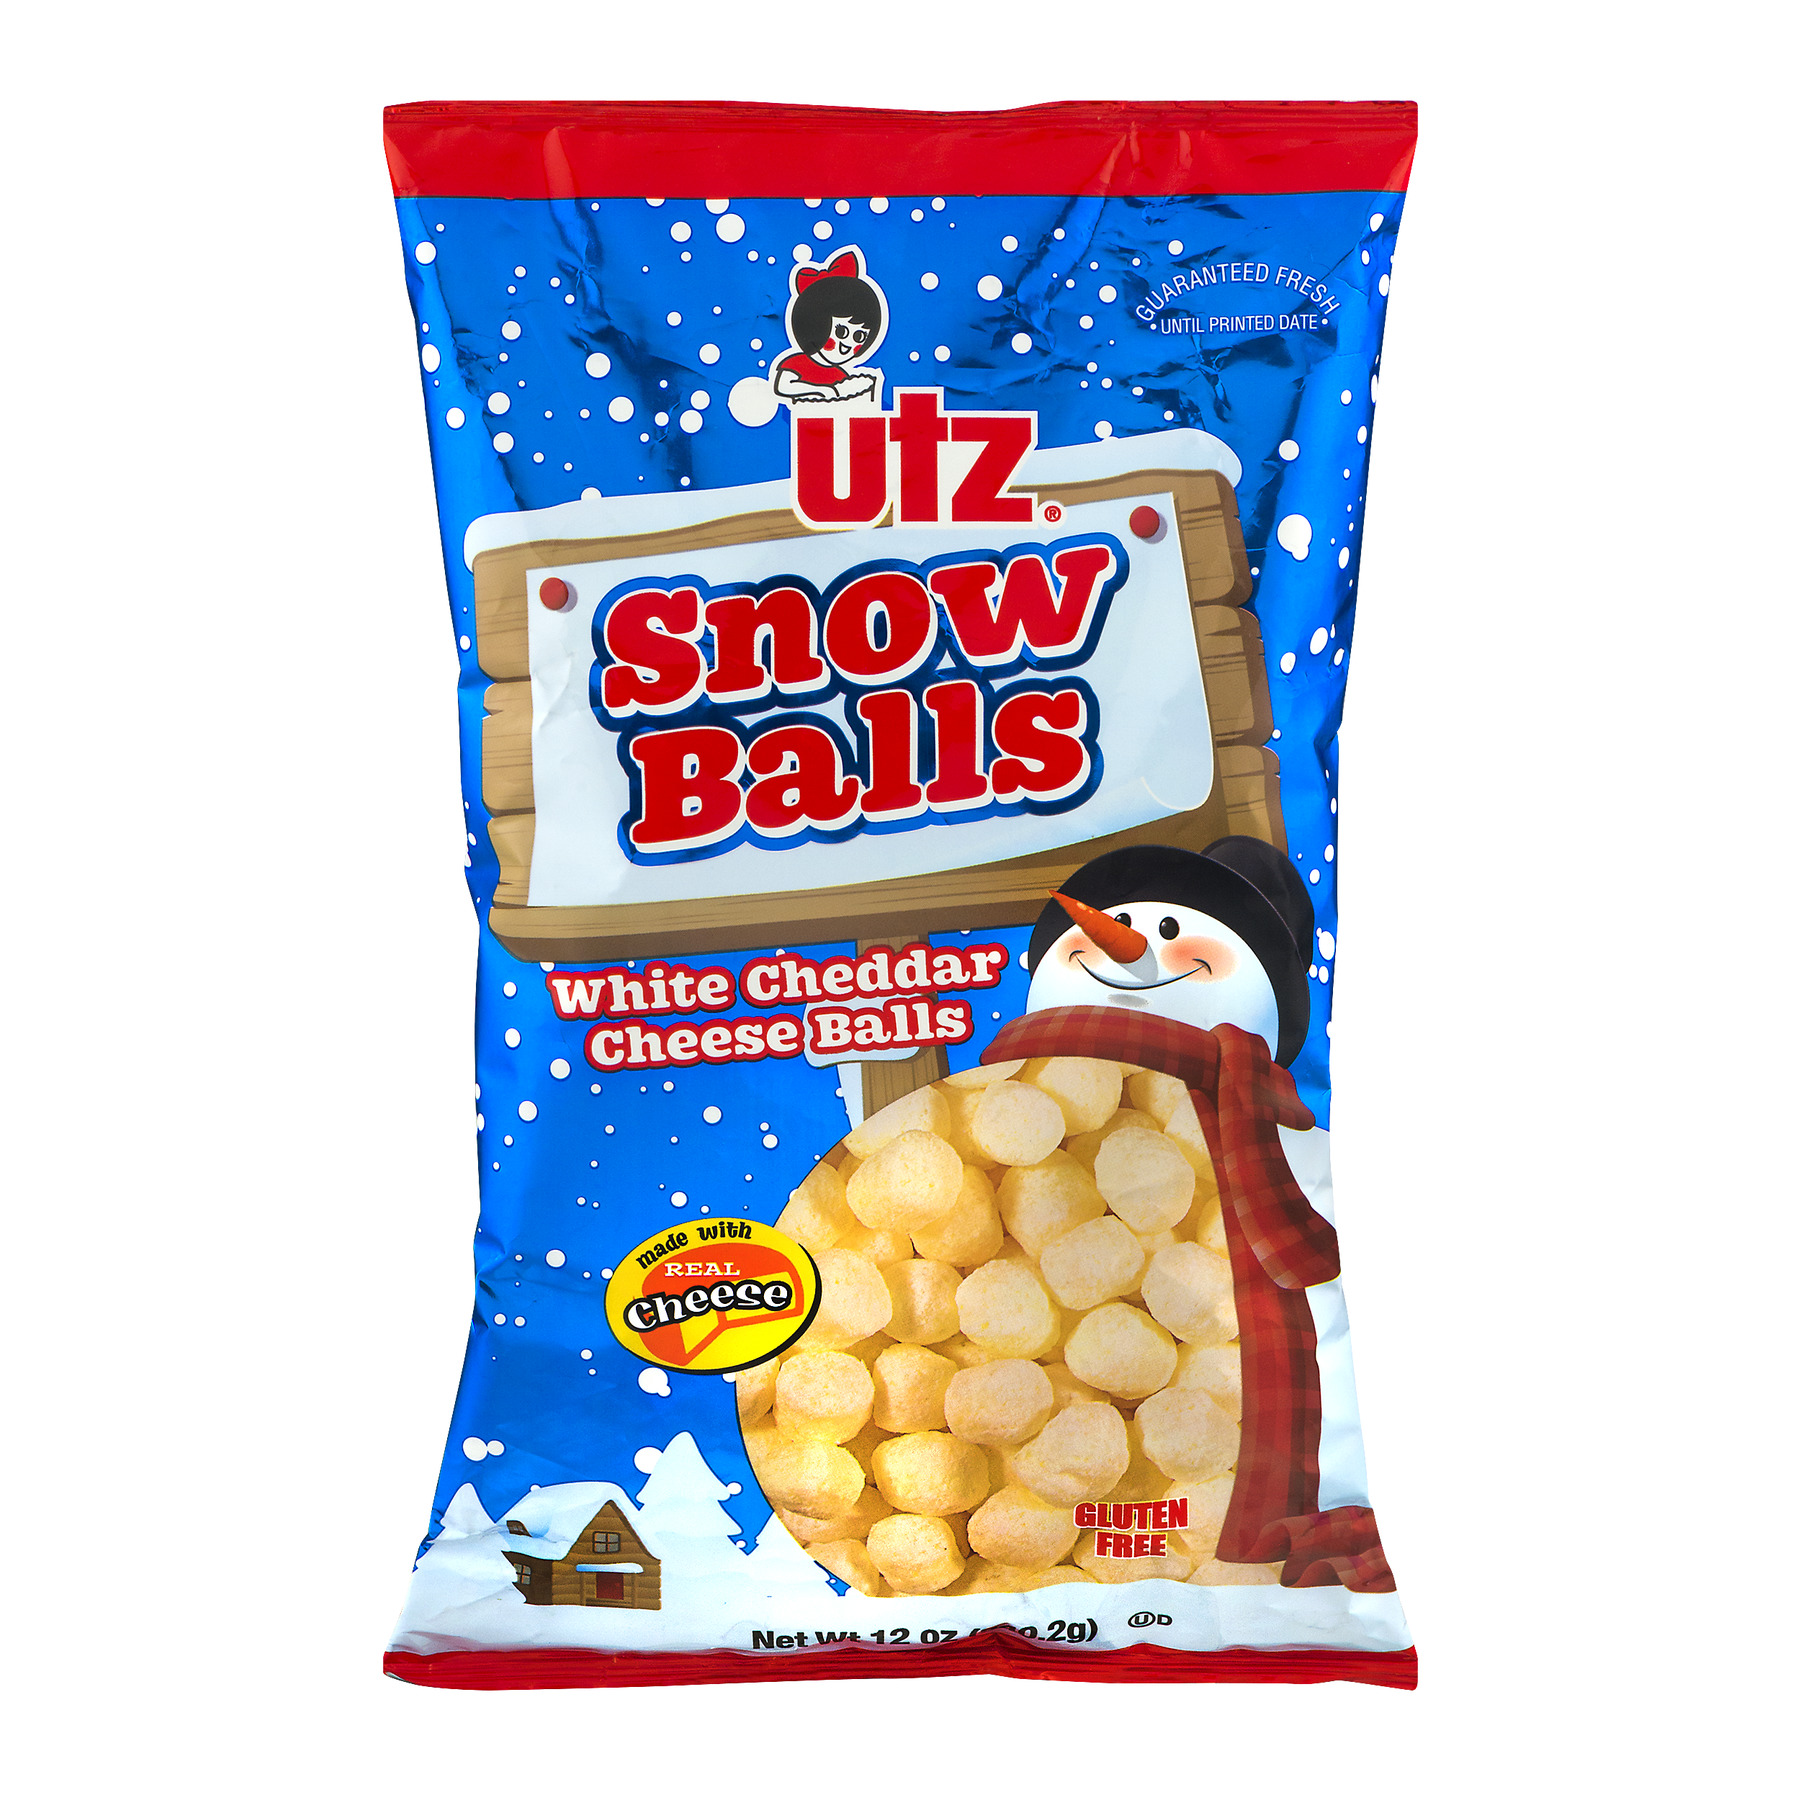 Compelling Utz Snow Balls Cheddar Cheese Balls Oz Walmart Planters Cheez Balls Home Design Ideas Planters Cheez Balls Walmart Planters Cheez Balls S Out nice food Planters Cheez Balls